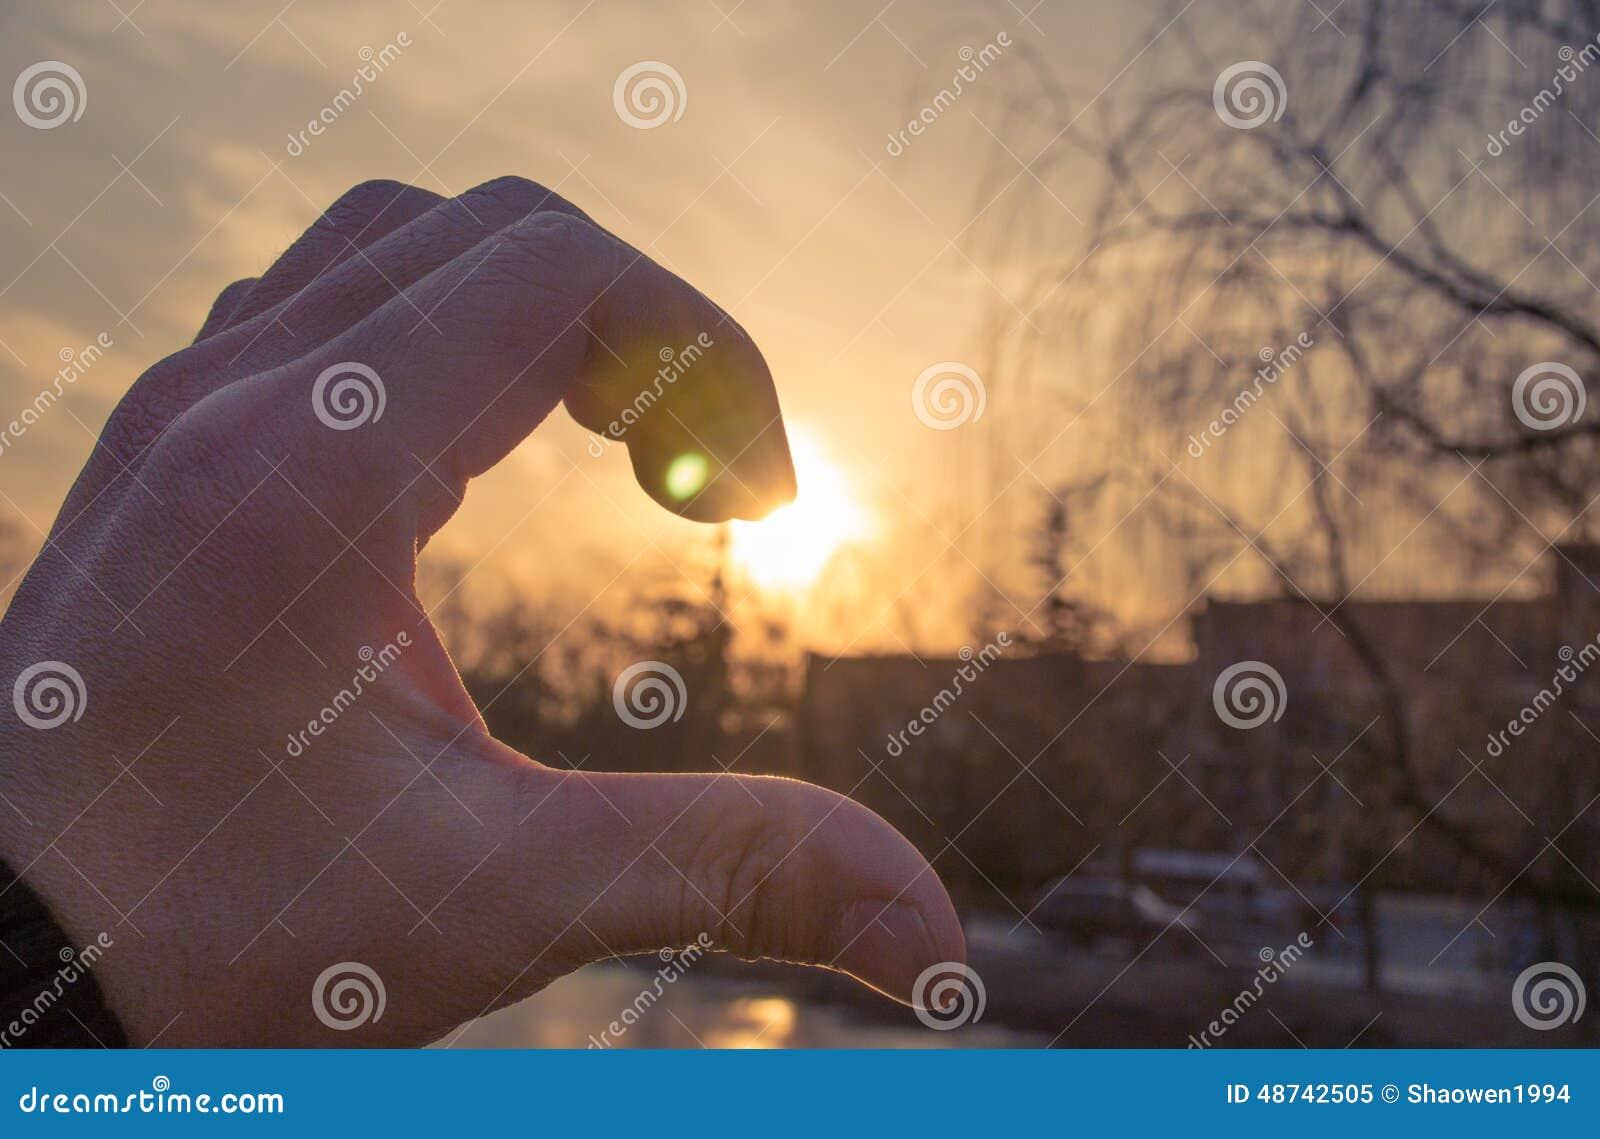 half hand heart gallery - photo #7